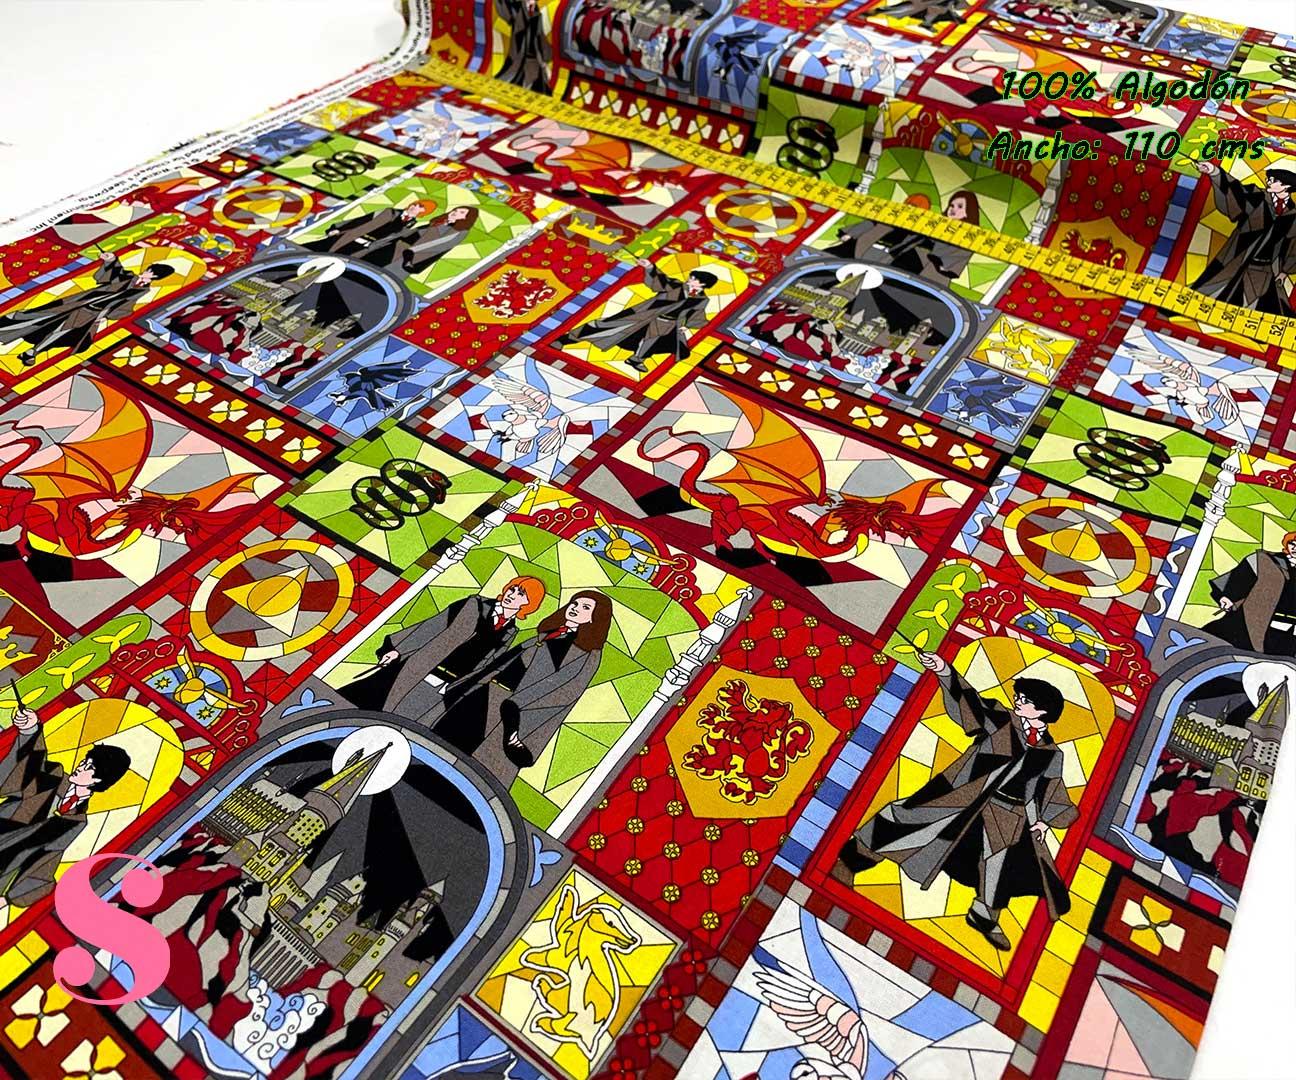 6-telas-frikis,telas-harry-potter-originales,telas-camelot,estampados-originales-harry-potter,Tejido Estampado Patch Americano Harry Potter Vidriera Personajes